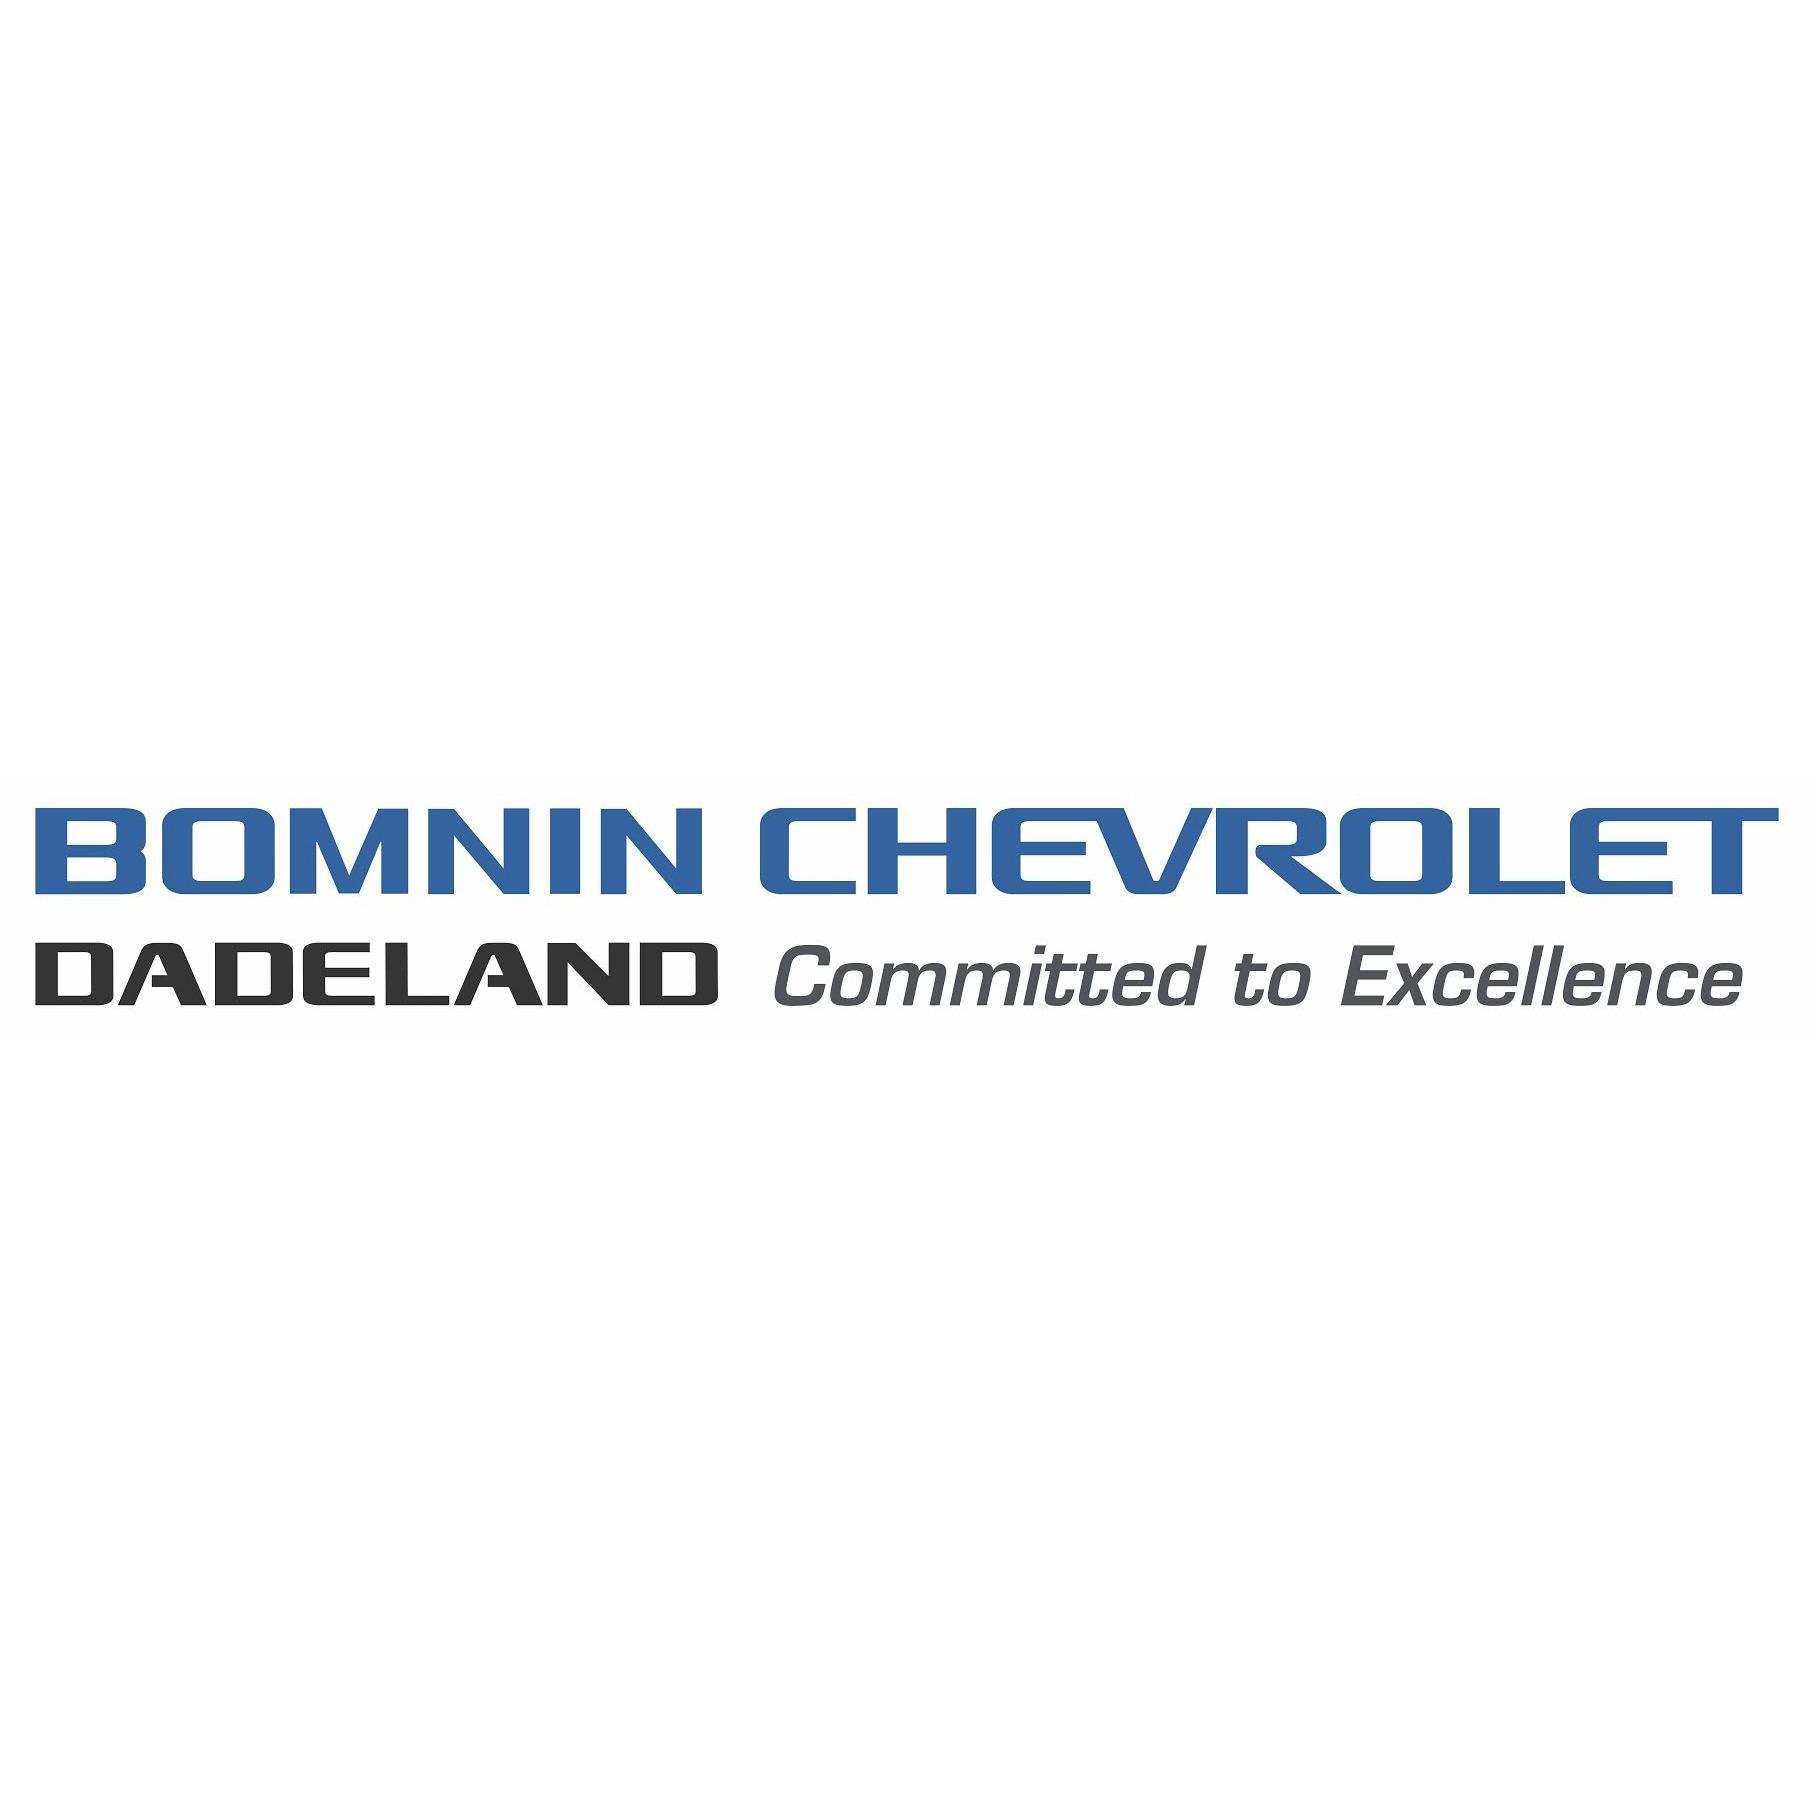 Bomnin Chevrolet Dadeland >> Bomnin Chevrolet Dadeland 8455 S Dixie Hwy Miami Fl Auto